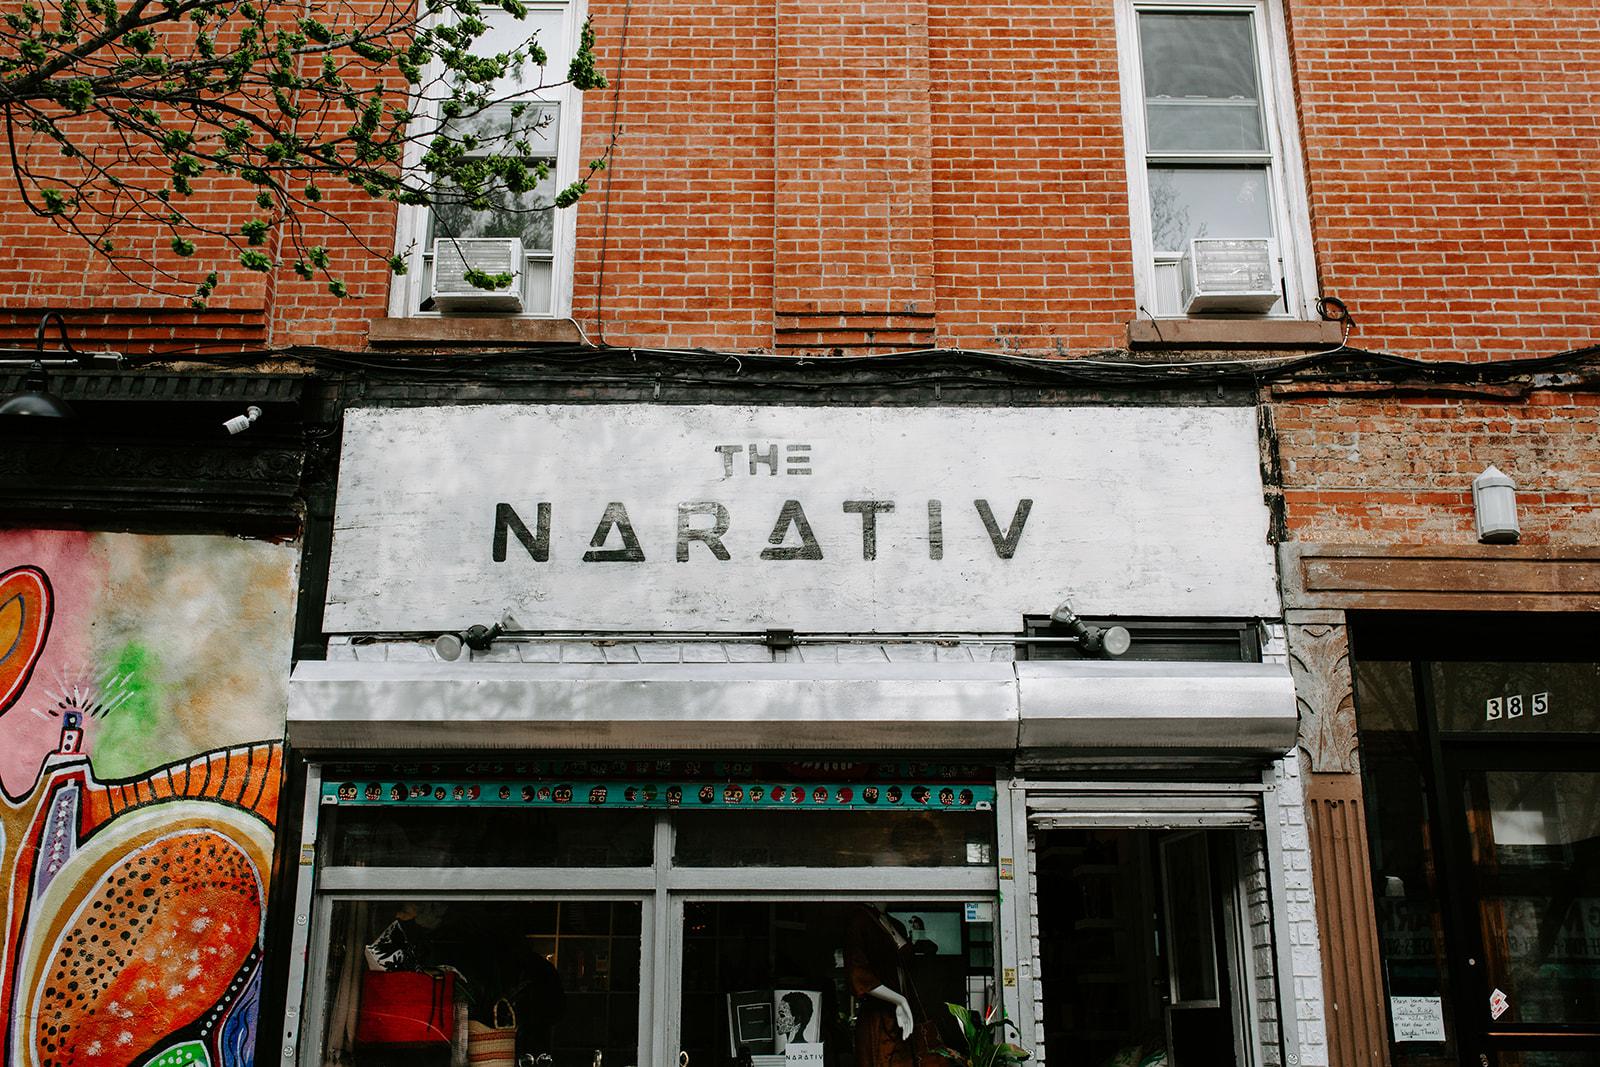 The Narativ x Indie Twenty Store Front